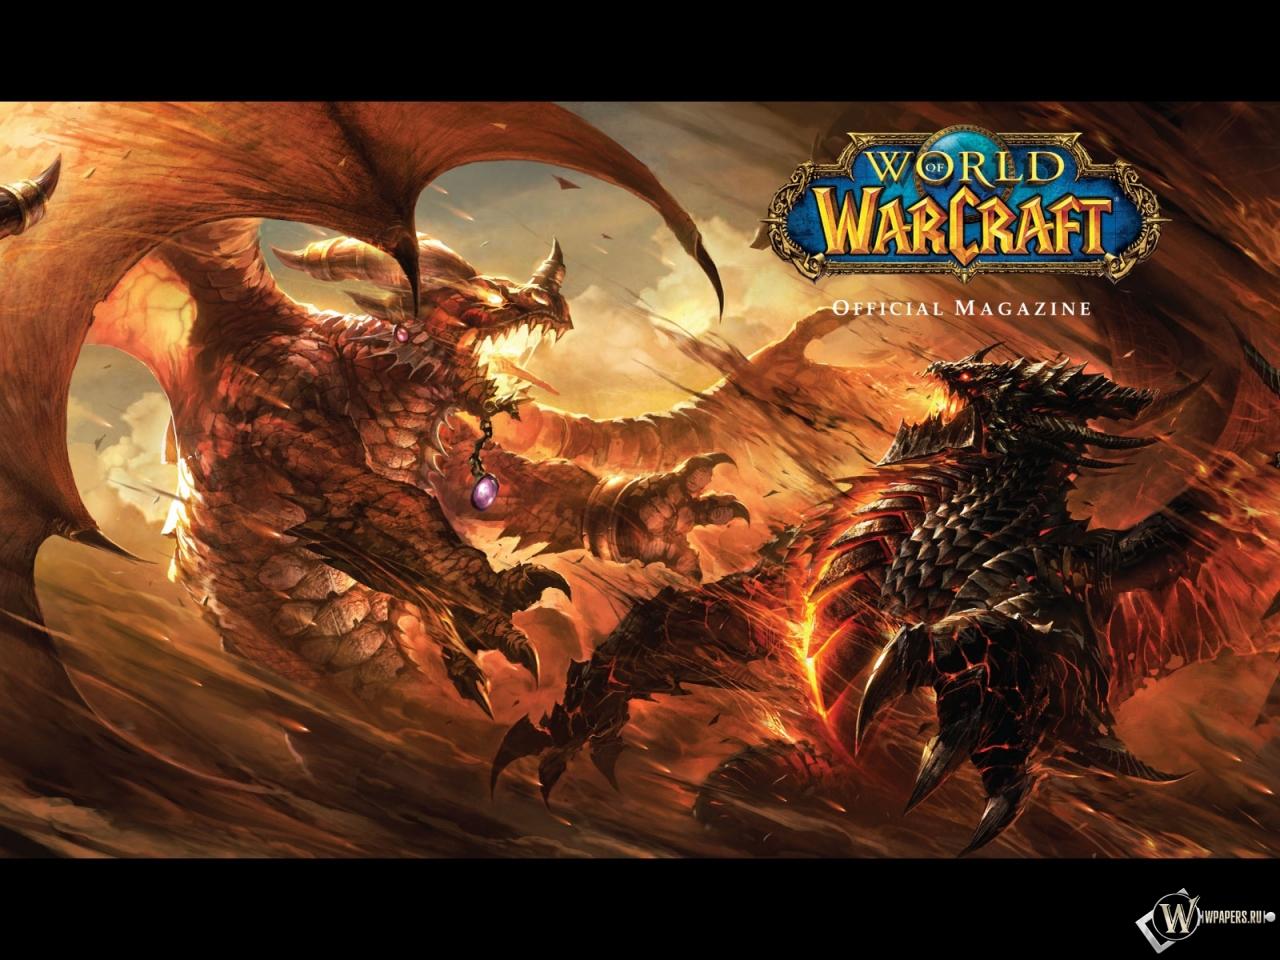 World of Warcraft 1280x960